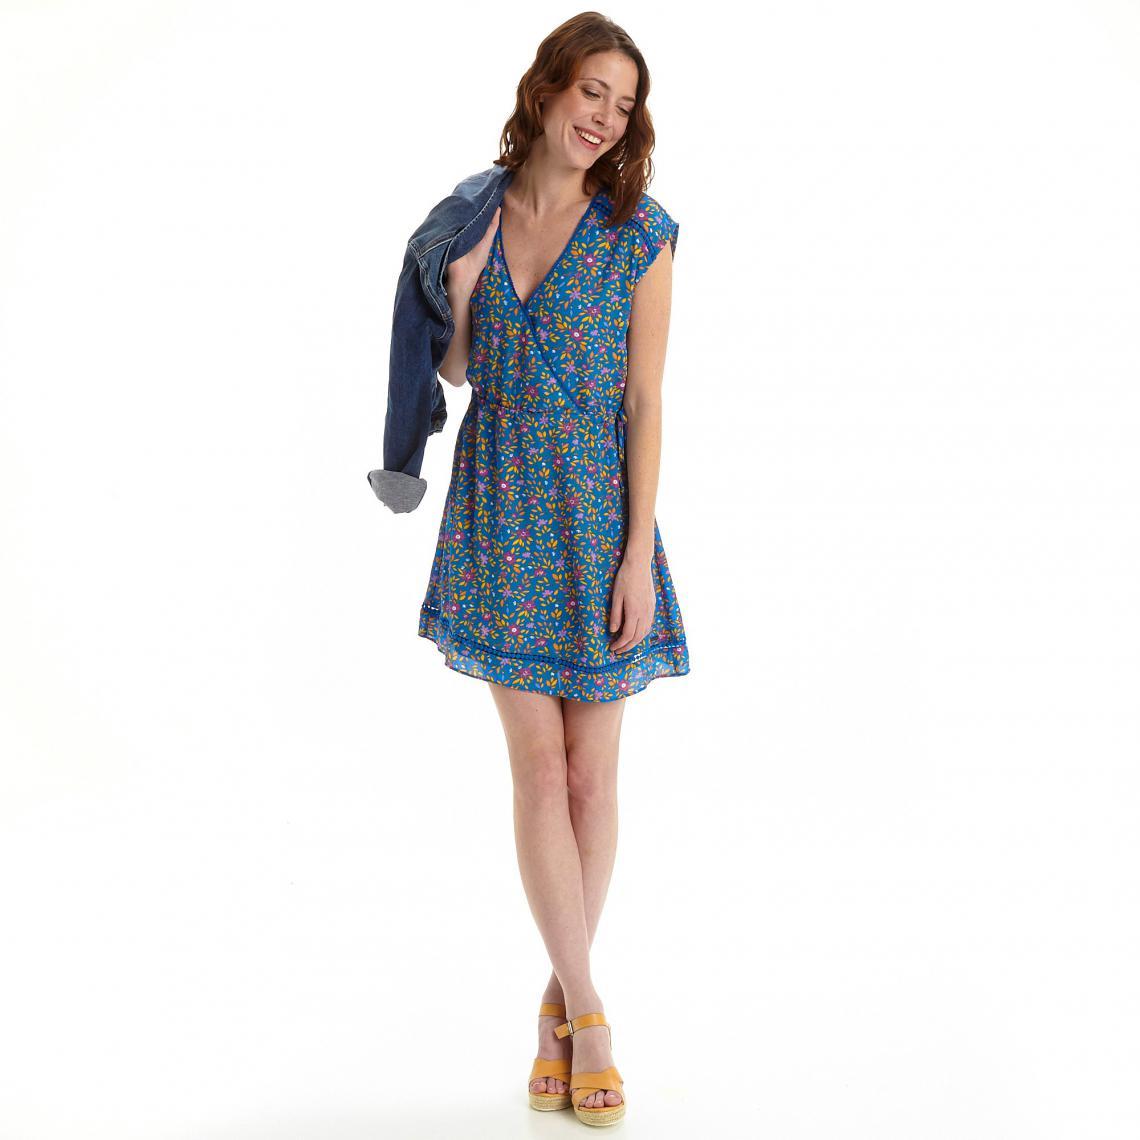 Robe Portefeuille Imprime Femme Pepe Jeans Bleu 3 Suisses